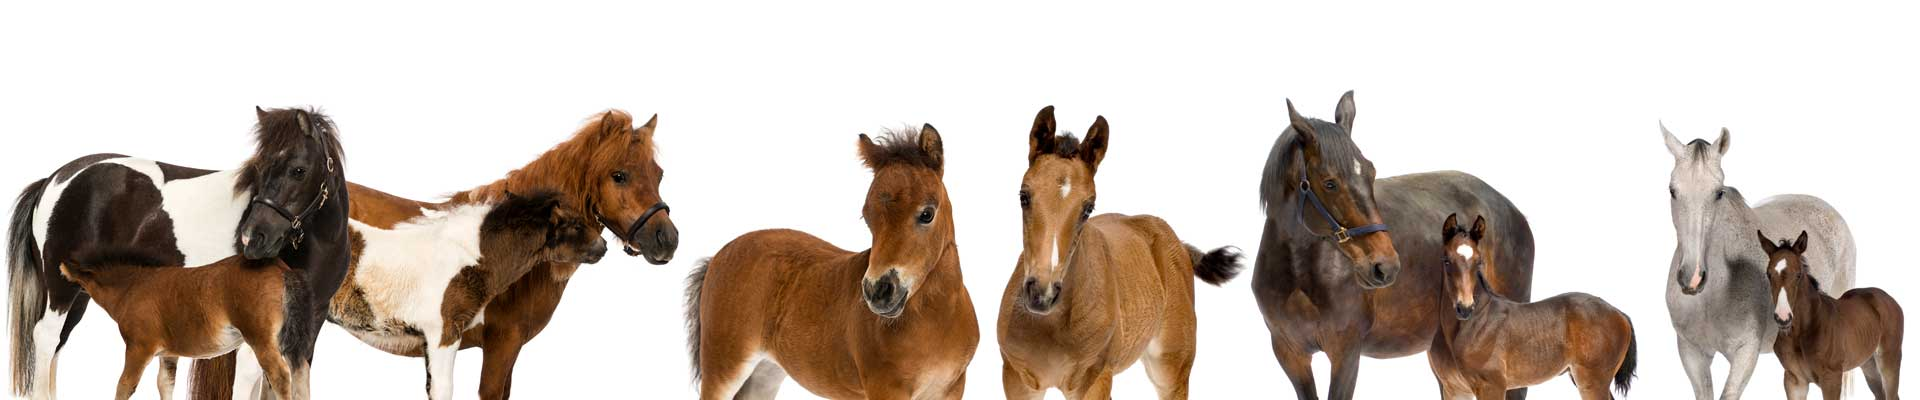 Paarden Gynaecologie Dierenarts praktijk Beetsterzwaag